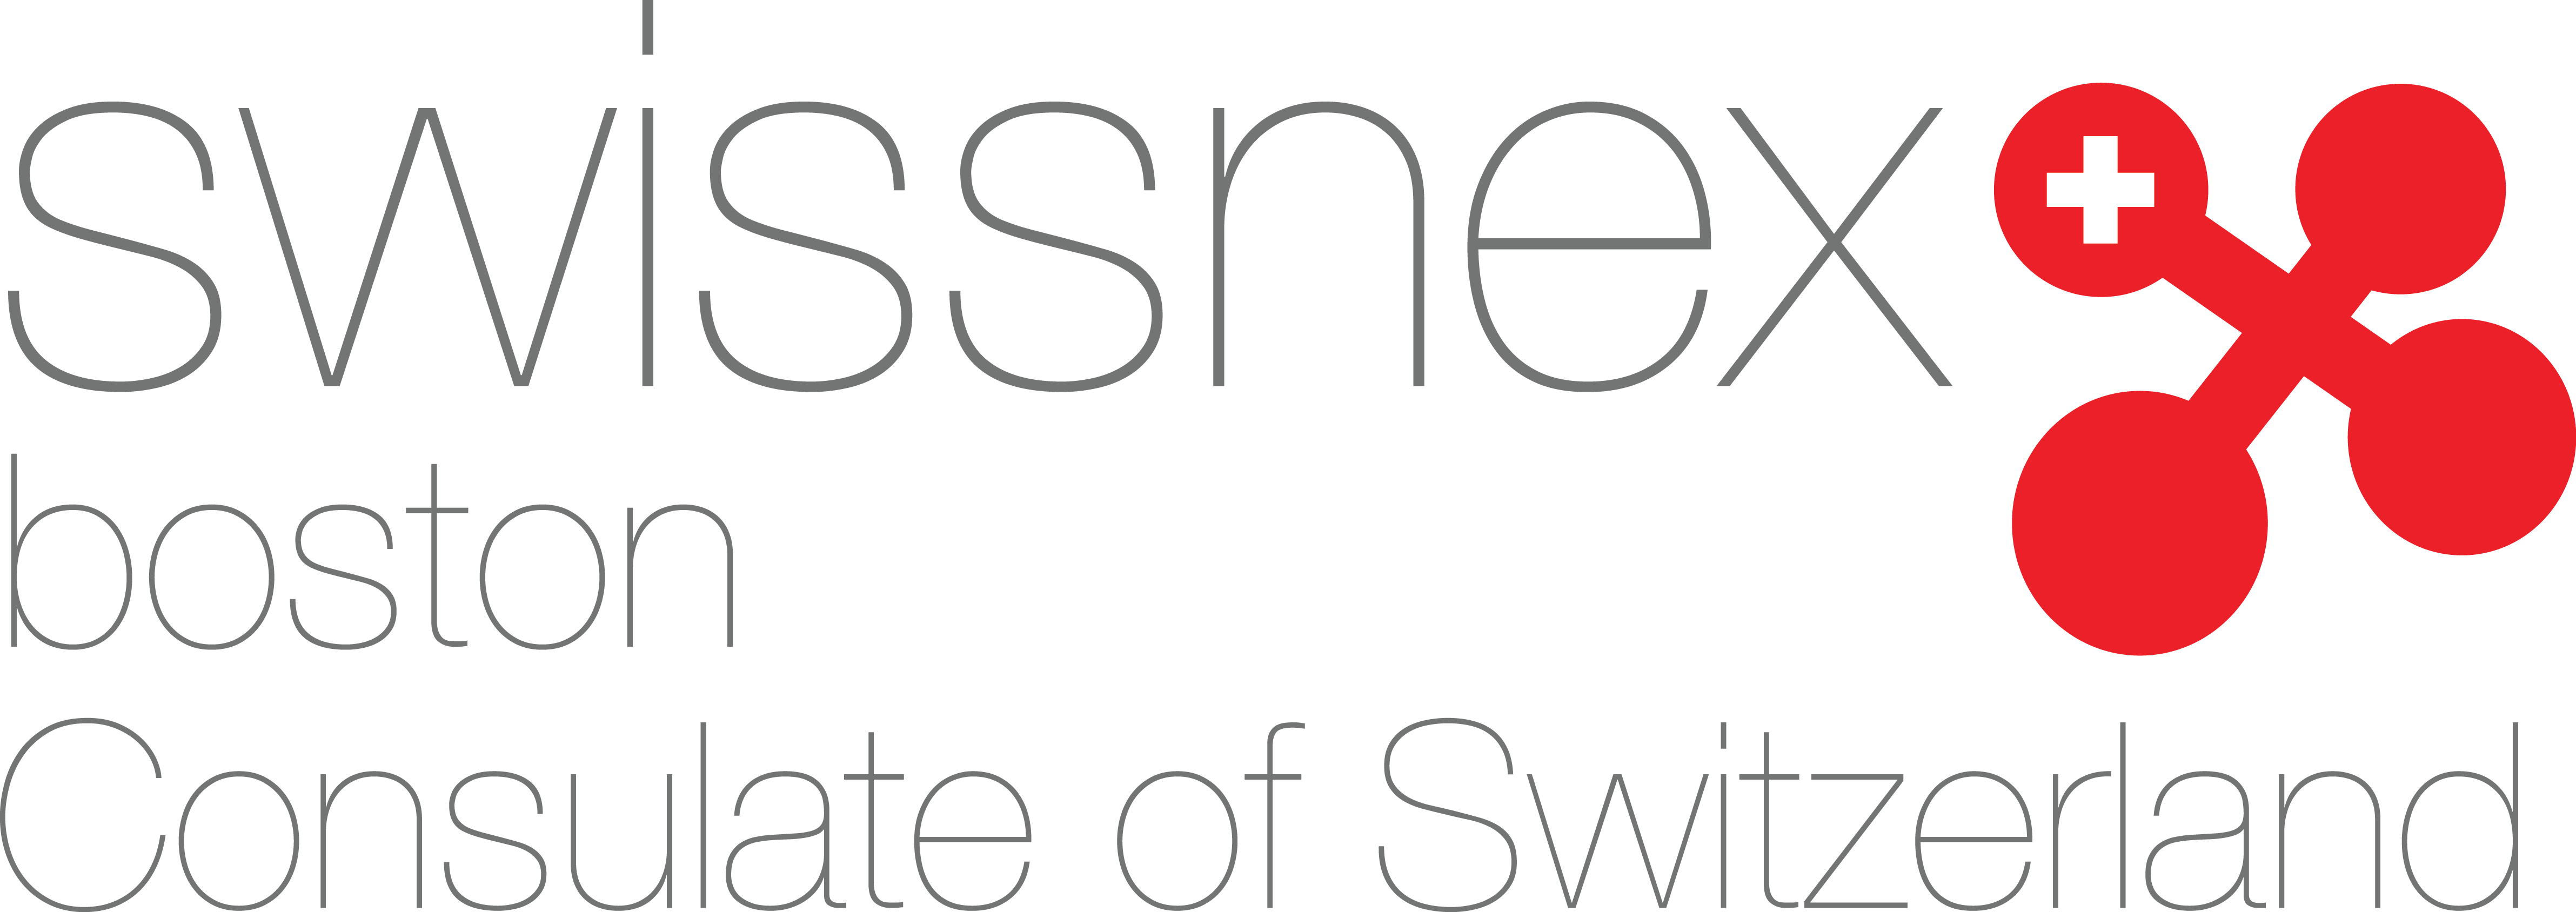 swissnex-logo-consulate